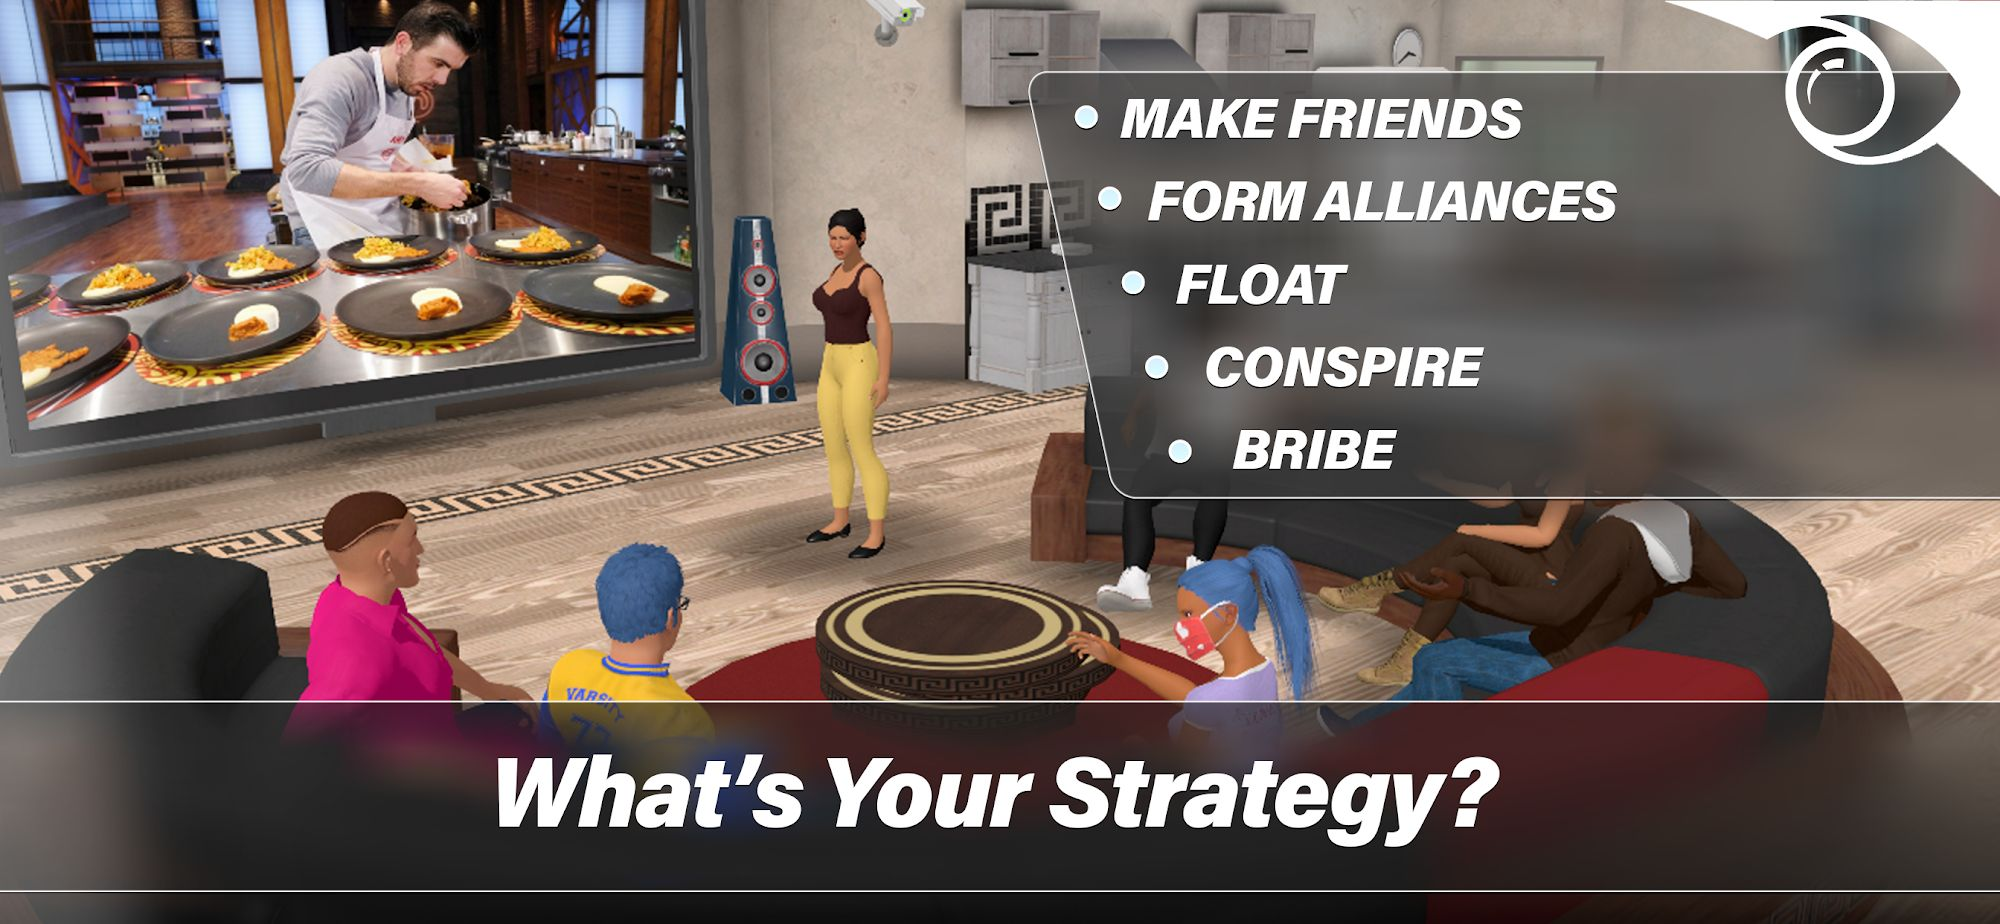 Big Brother: The Game スクリーンショット1